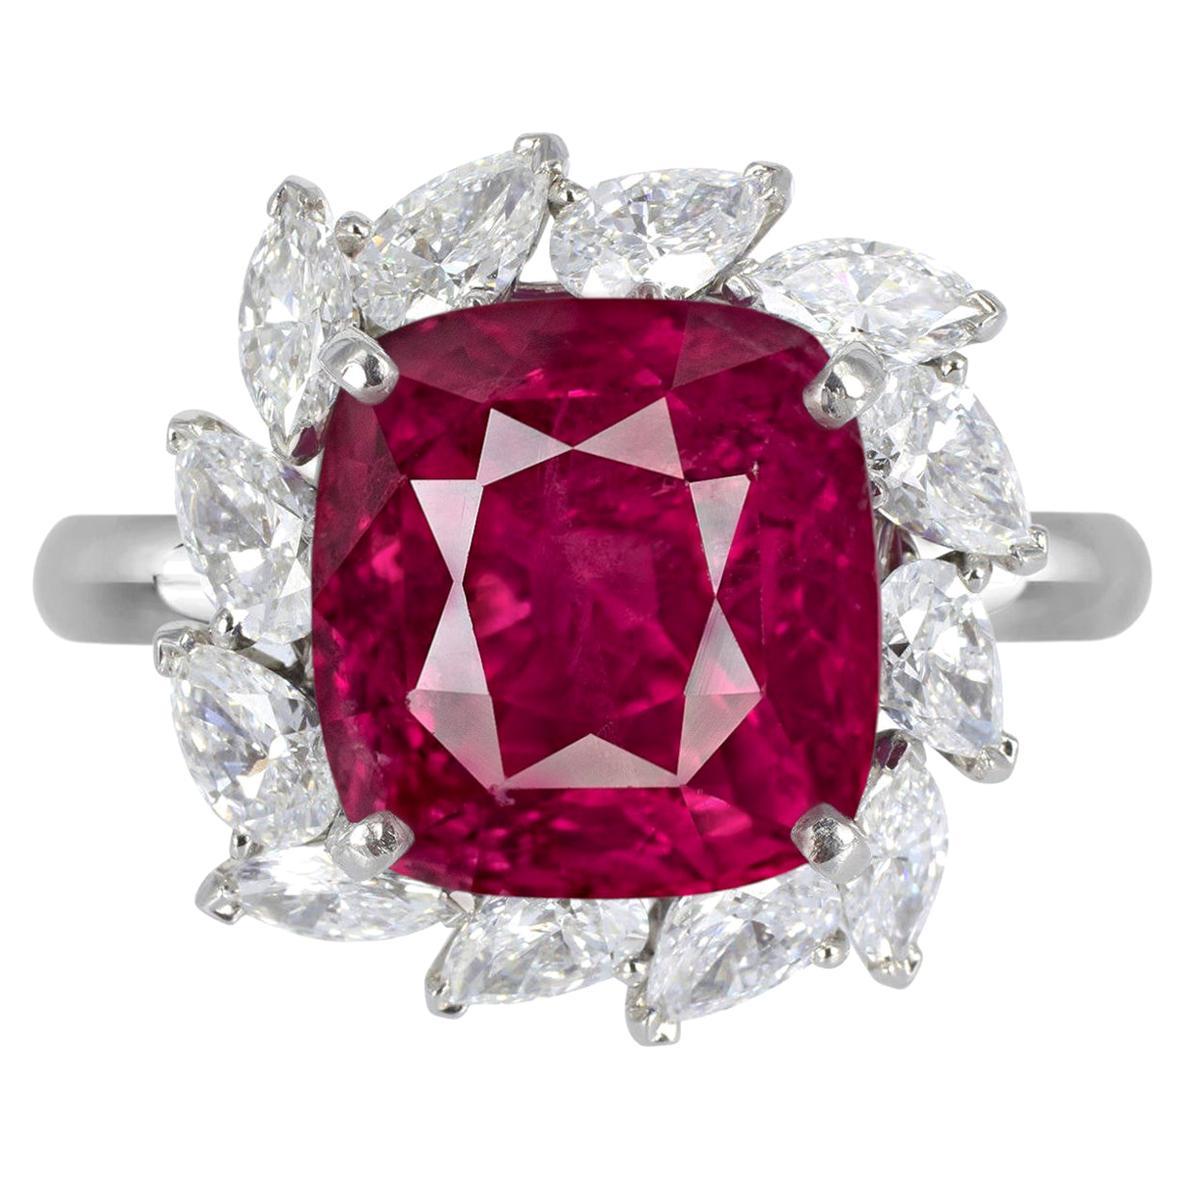 GIA Certified 6.21 Carat Vivid Red Ruby No Heat Diamond Cocktail Ring